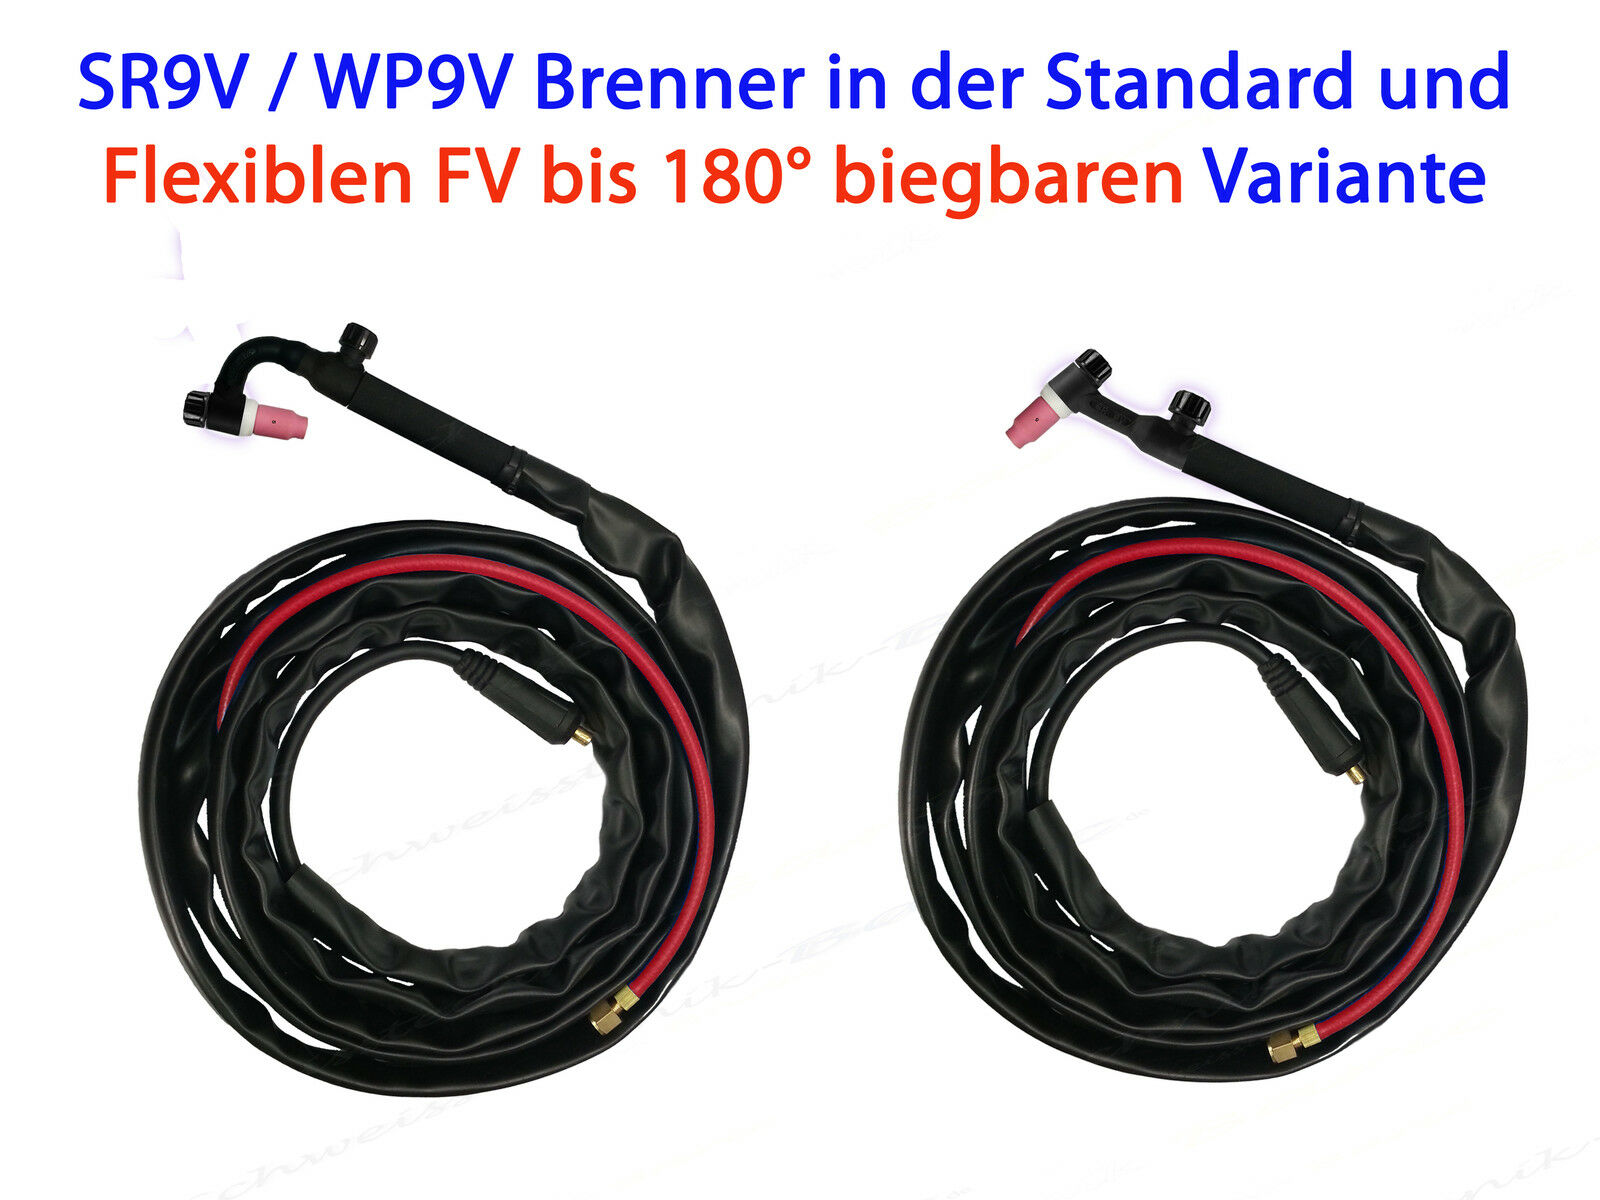 WIG Schlauchpaket SR9 SR 9 V Schweiß-Inverter Schweissbrenner SR9V Brenner SR 9V